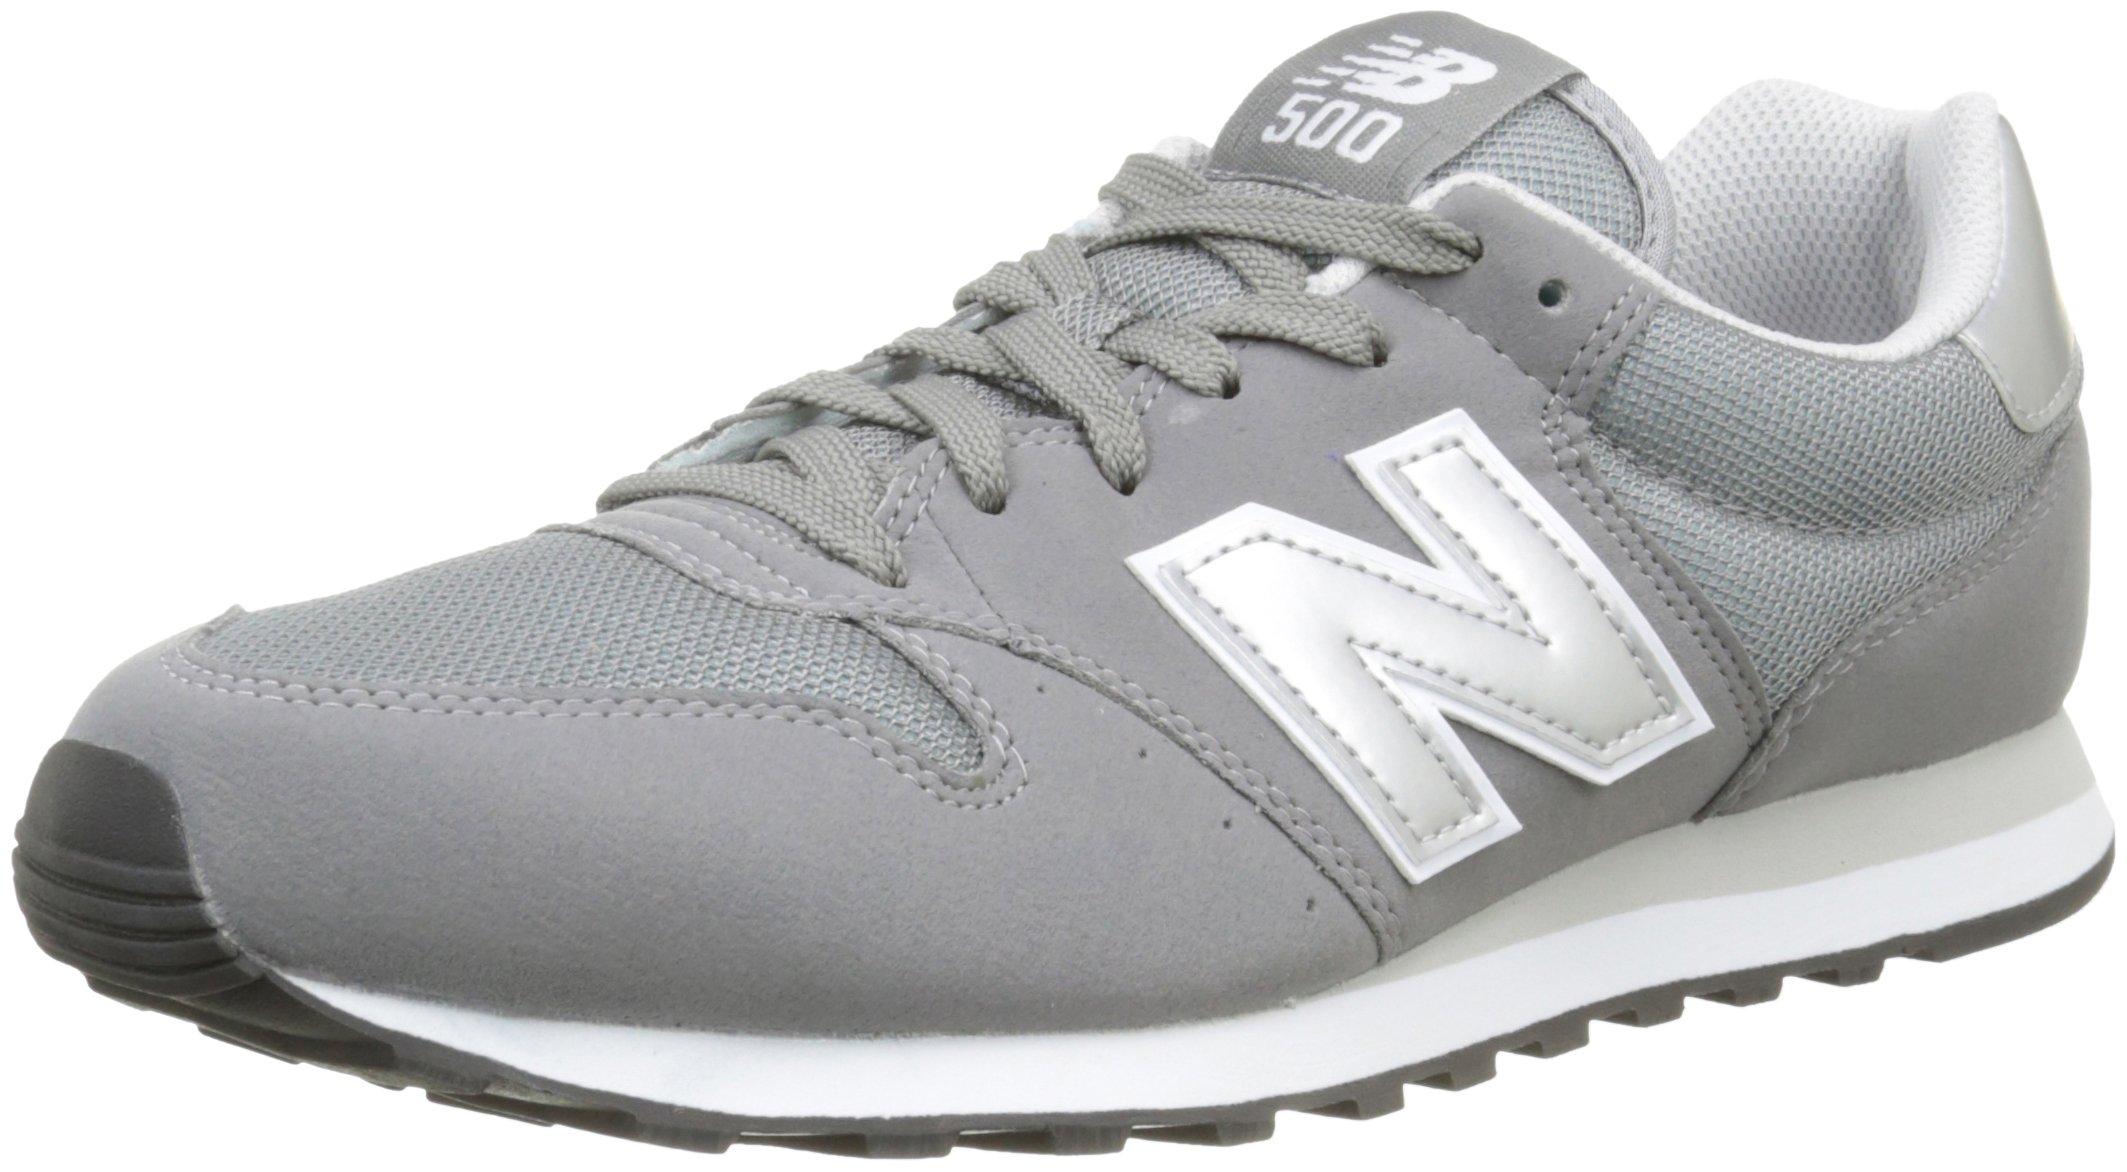 New Balance 500 Core, Zapatillas para Hombre product image